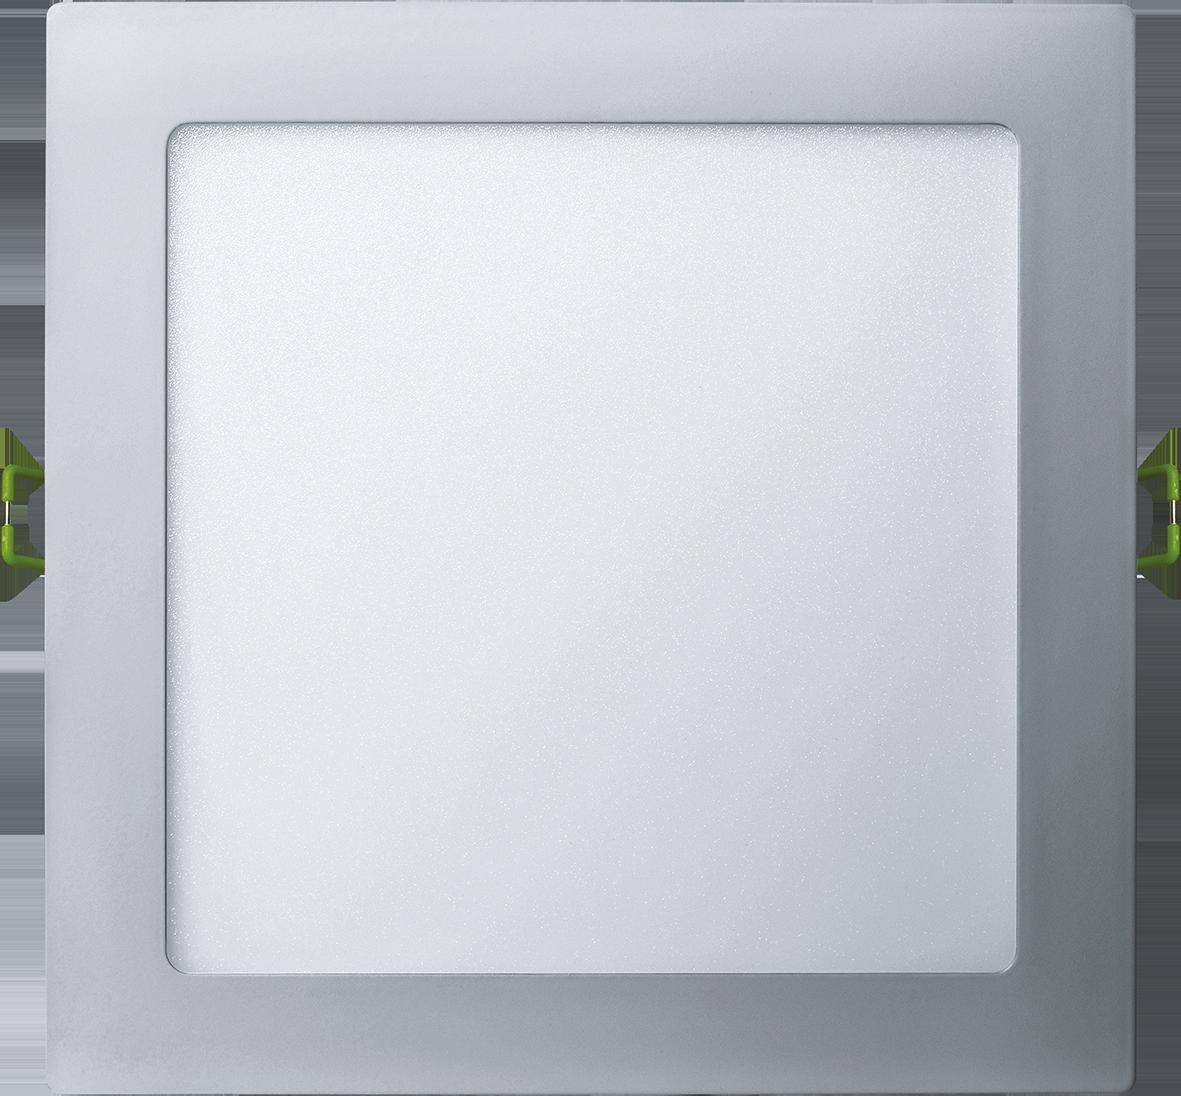 Светильник NLP-S1-19W-840-SL-LED (225*225) 94 459 Navigator